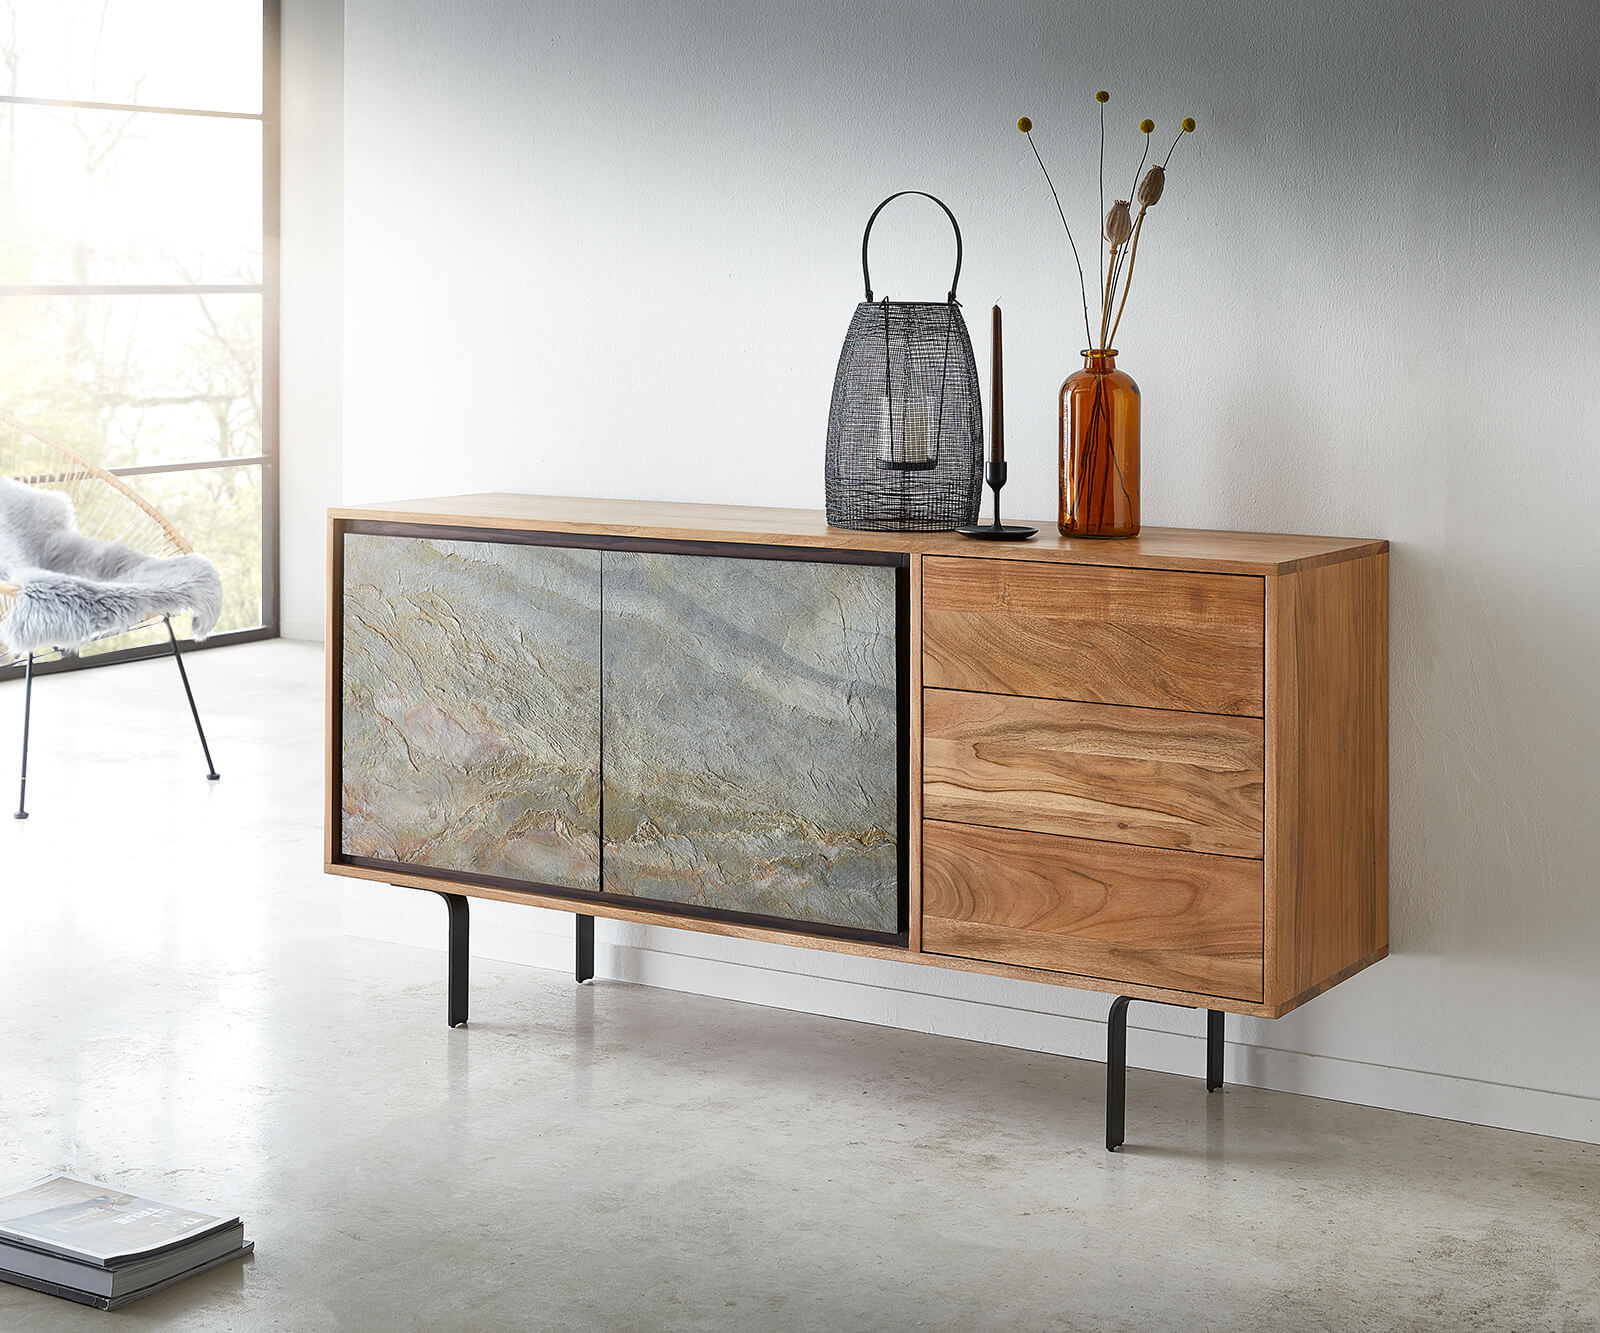 delife-sideboard-juwelo-150-cm-akazie-natur-mit-steinfurnier-sideboards